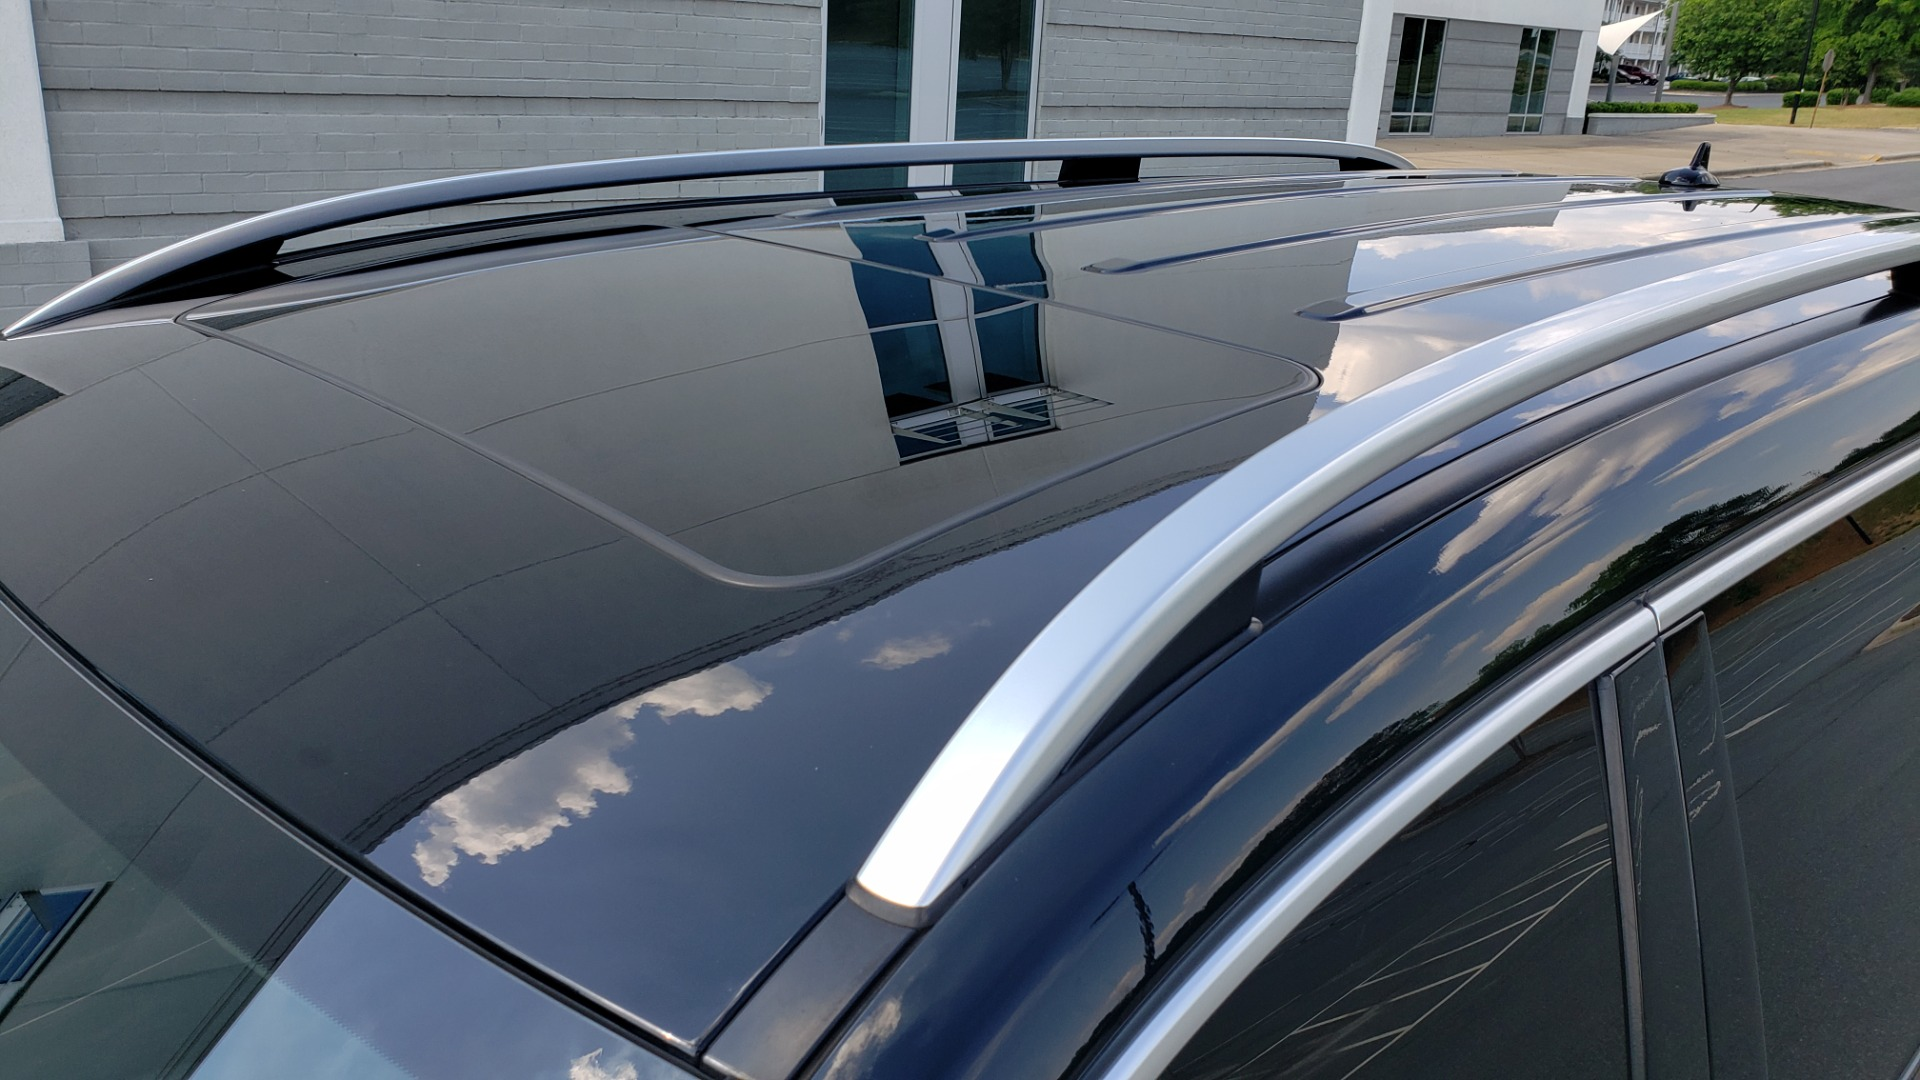 Used 2017 Mercedes-Benz GLS GLS 550 for sale Sold at Formula Imports in Charlotte NC 28227 10